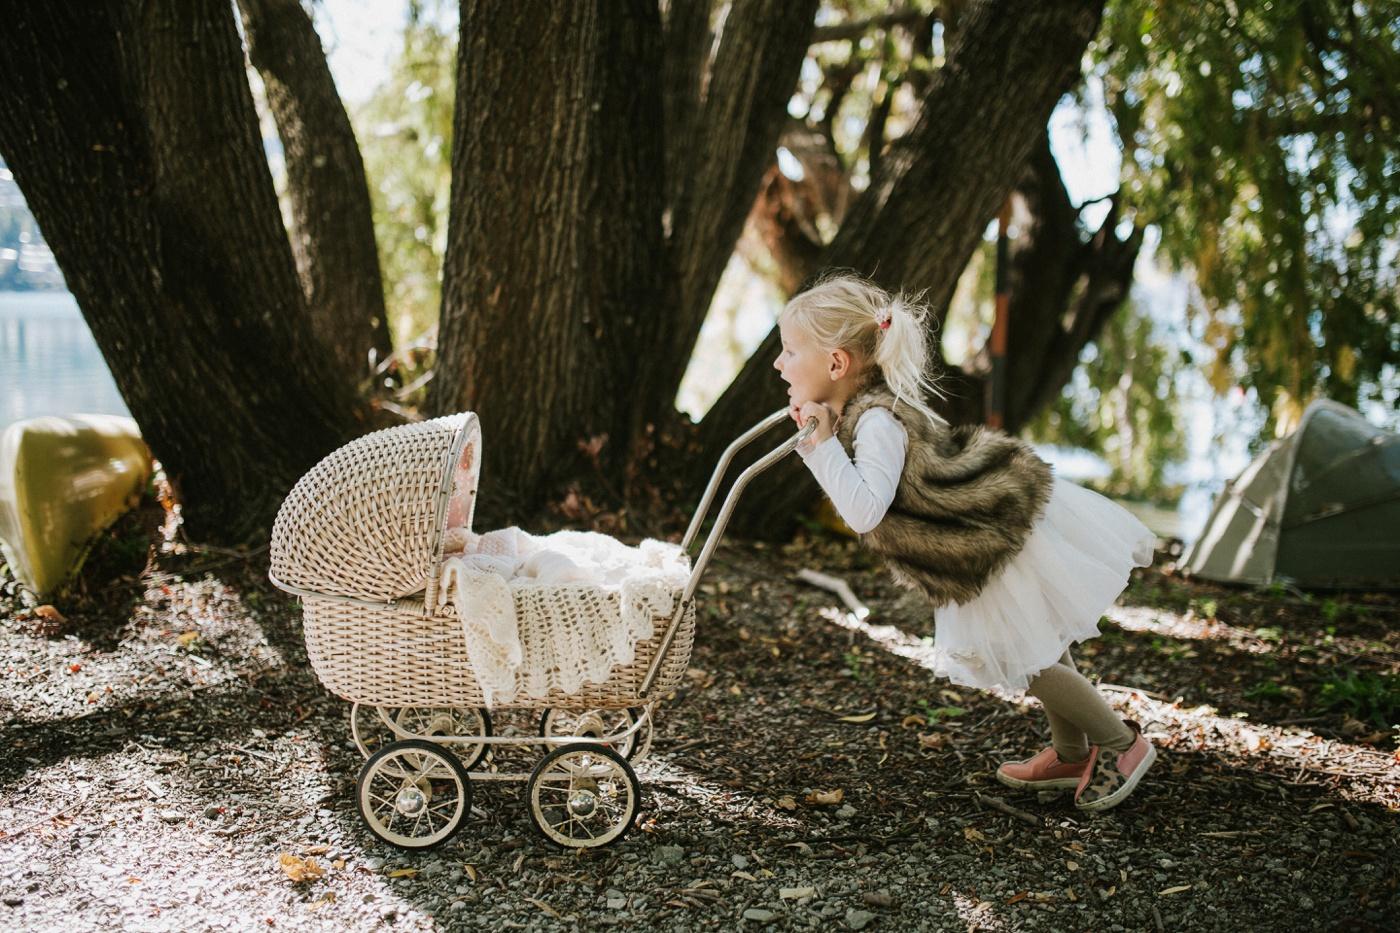 Blake-Lily-Rolig-Lekfull-Familjesession-Familjefotograf-Stockholm-Orebro_30